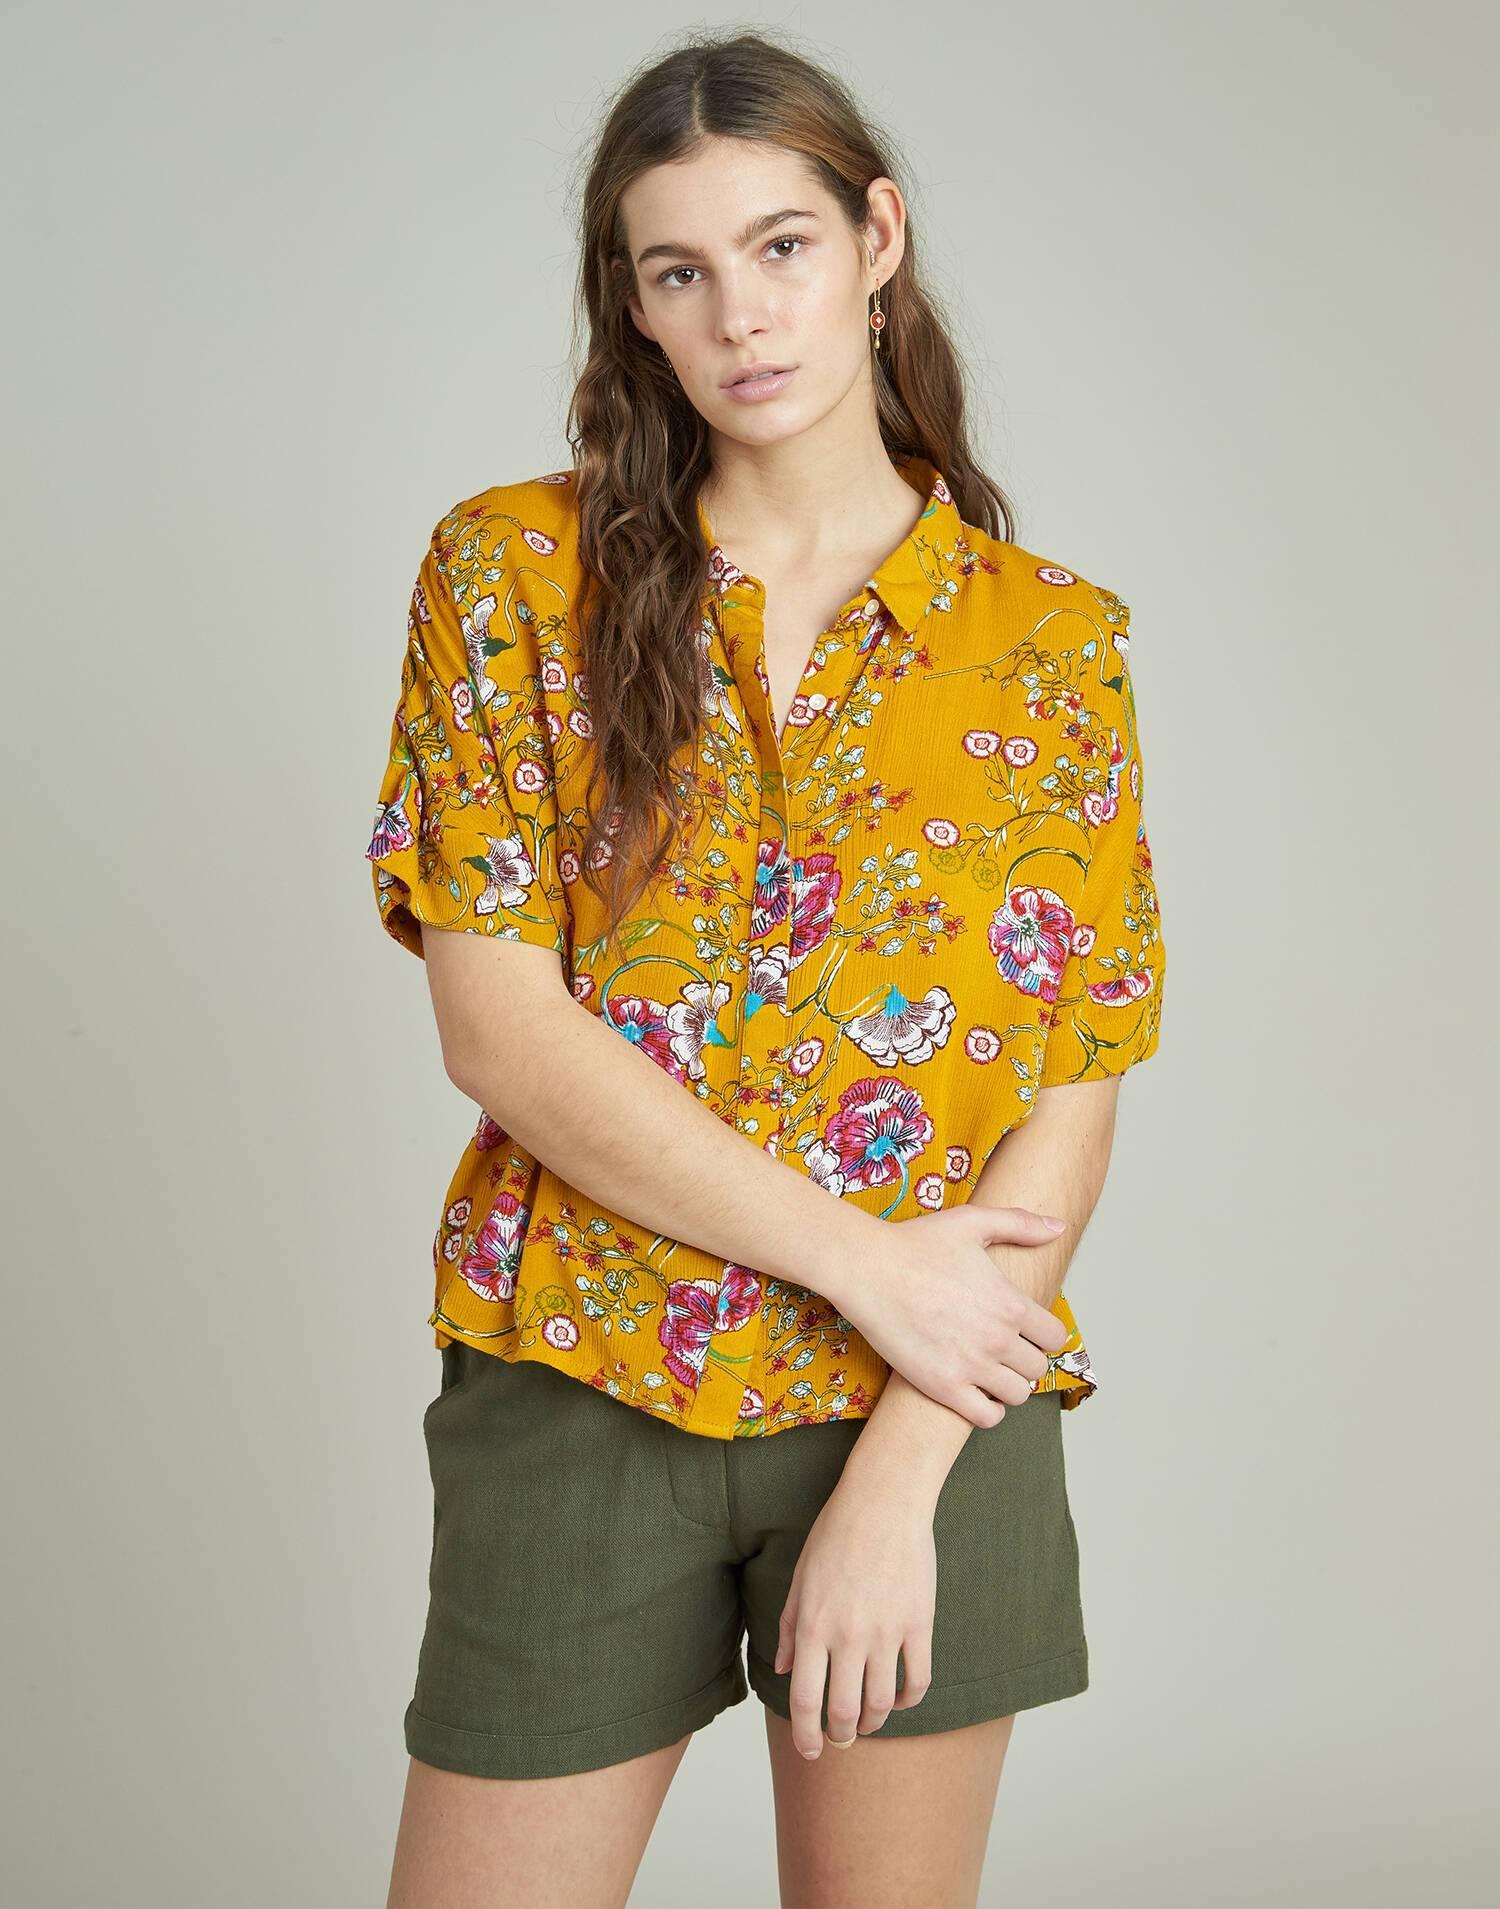 Floral short sleeves shirt